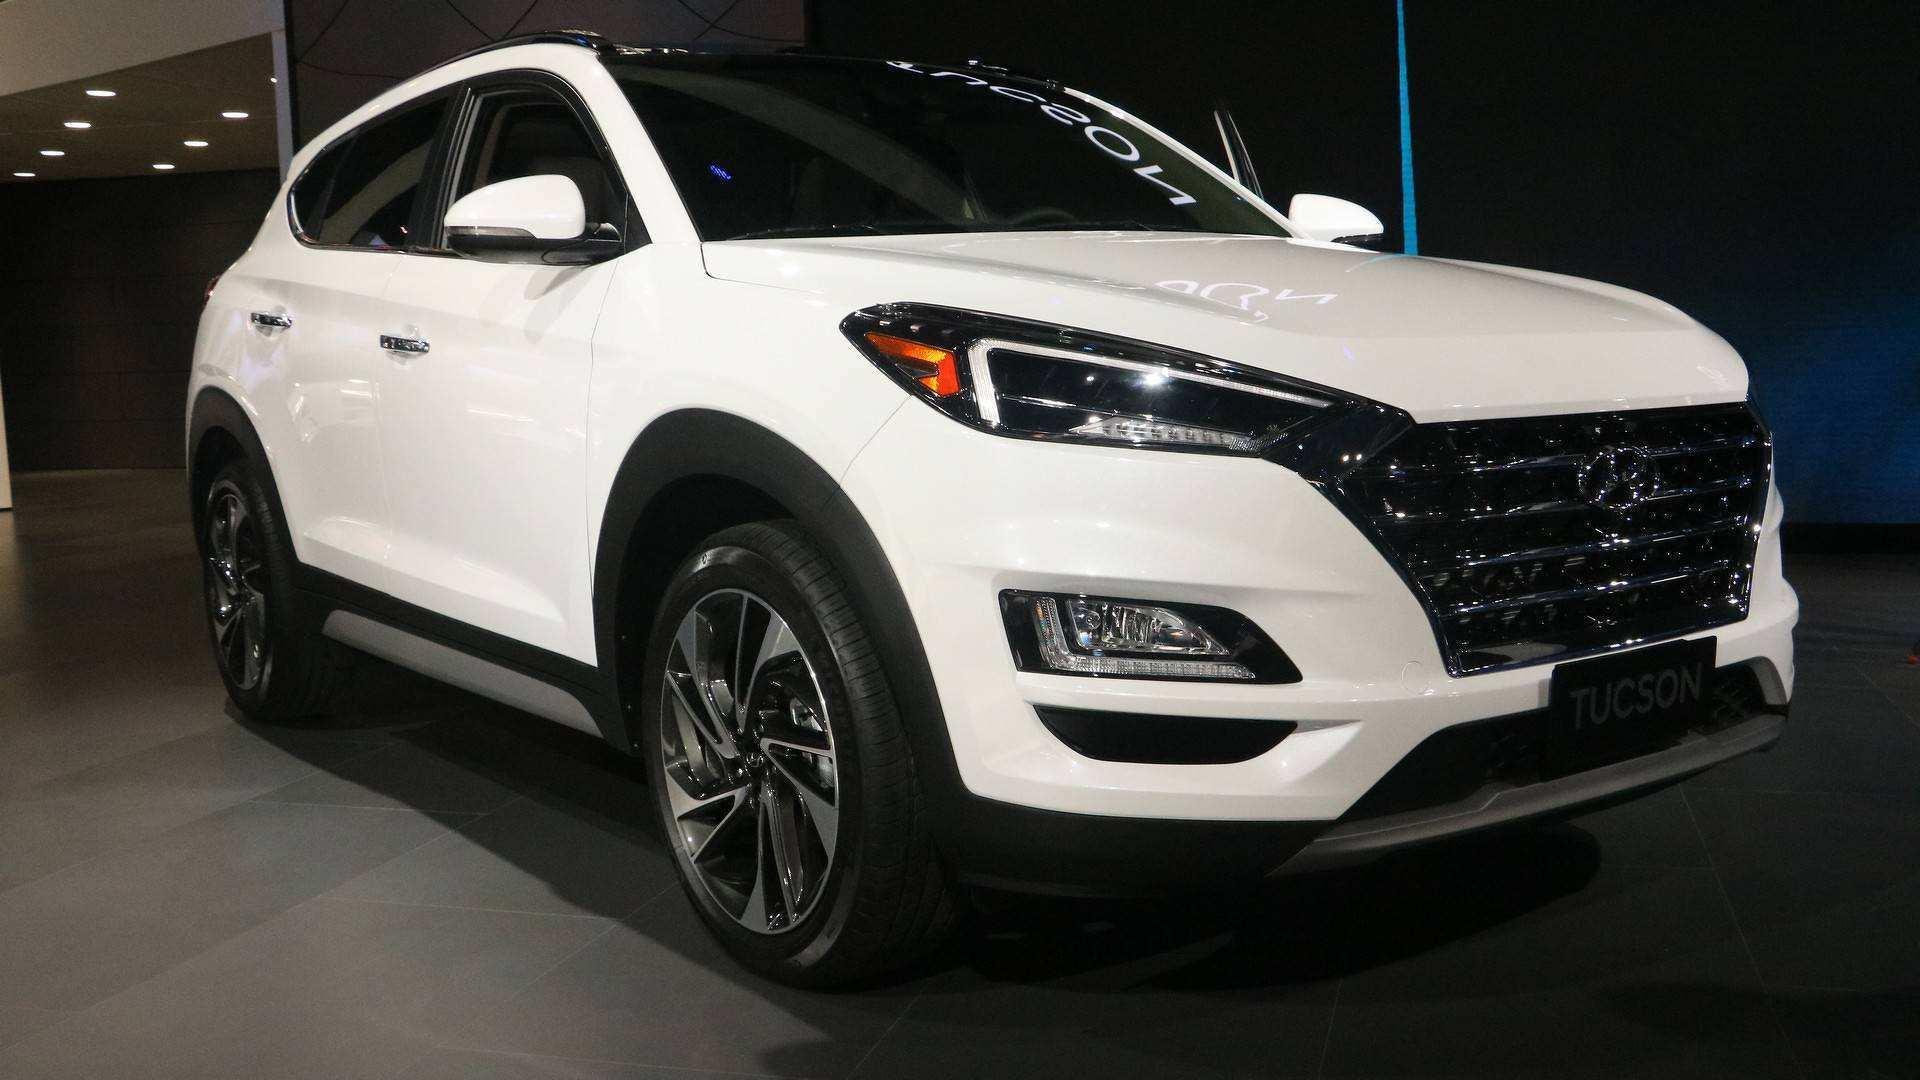 83 Concept of Hyundai New 2019 Images by Hyundai New 2019